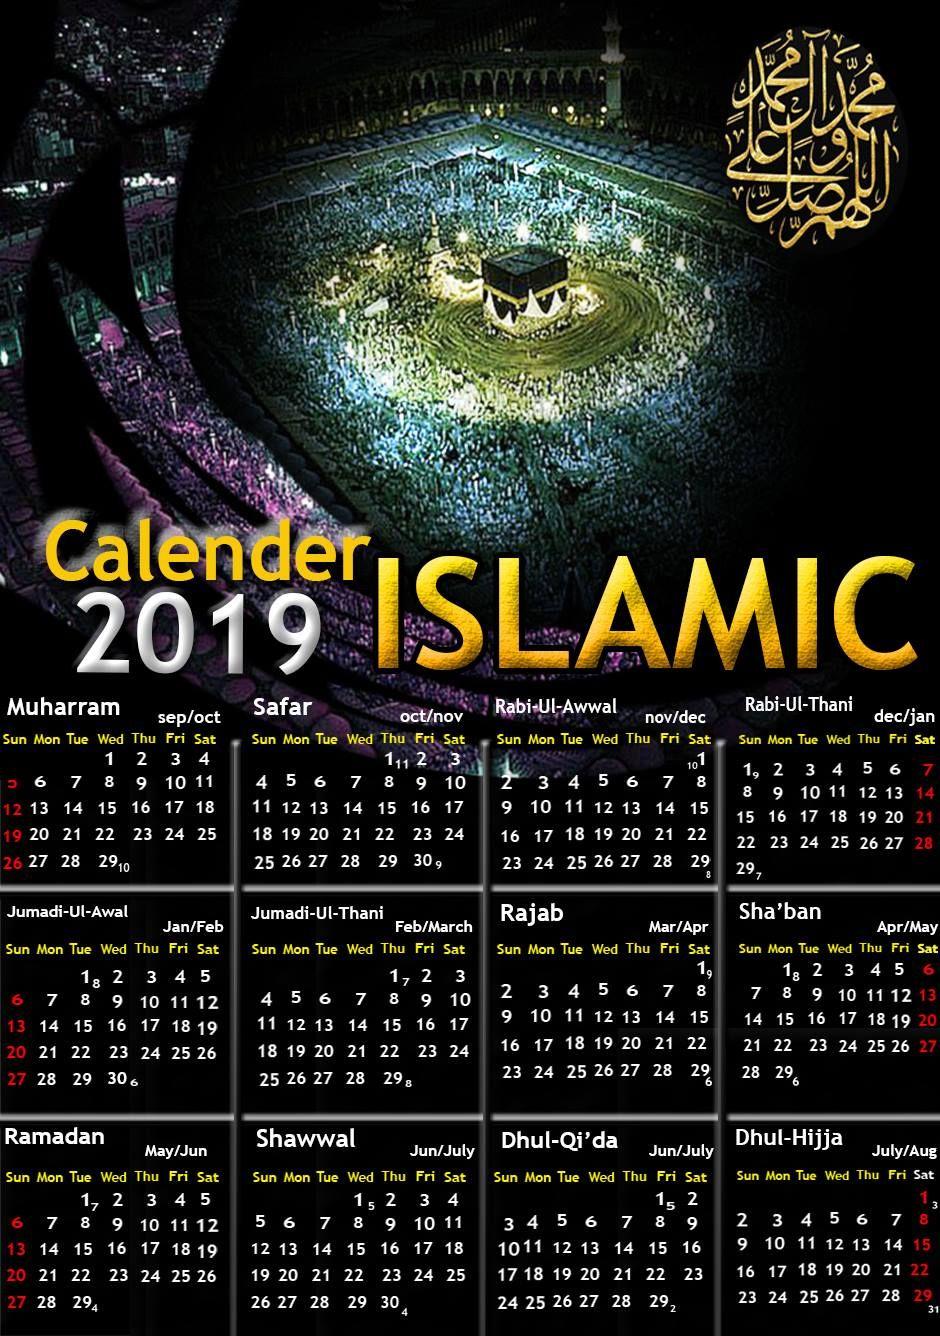 New Islamic Calendar 2019 To Download Hijri Calendar Islamic Calendar Today Calendar